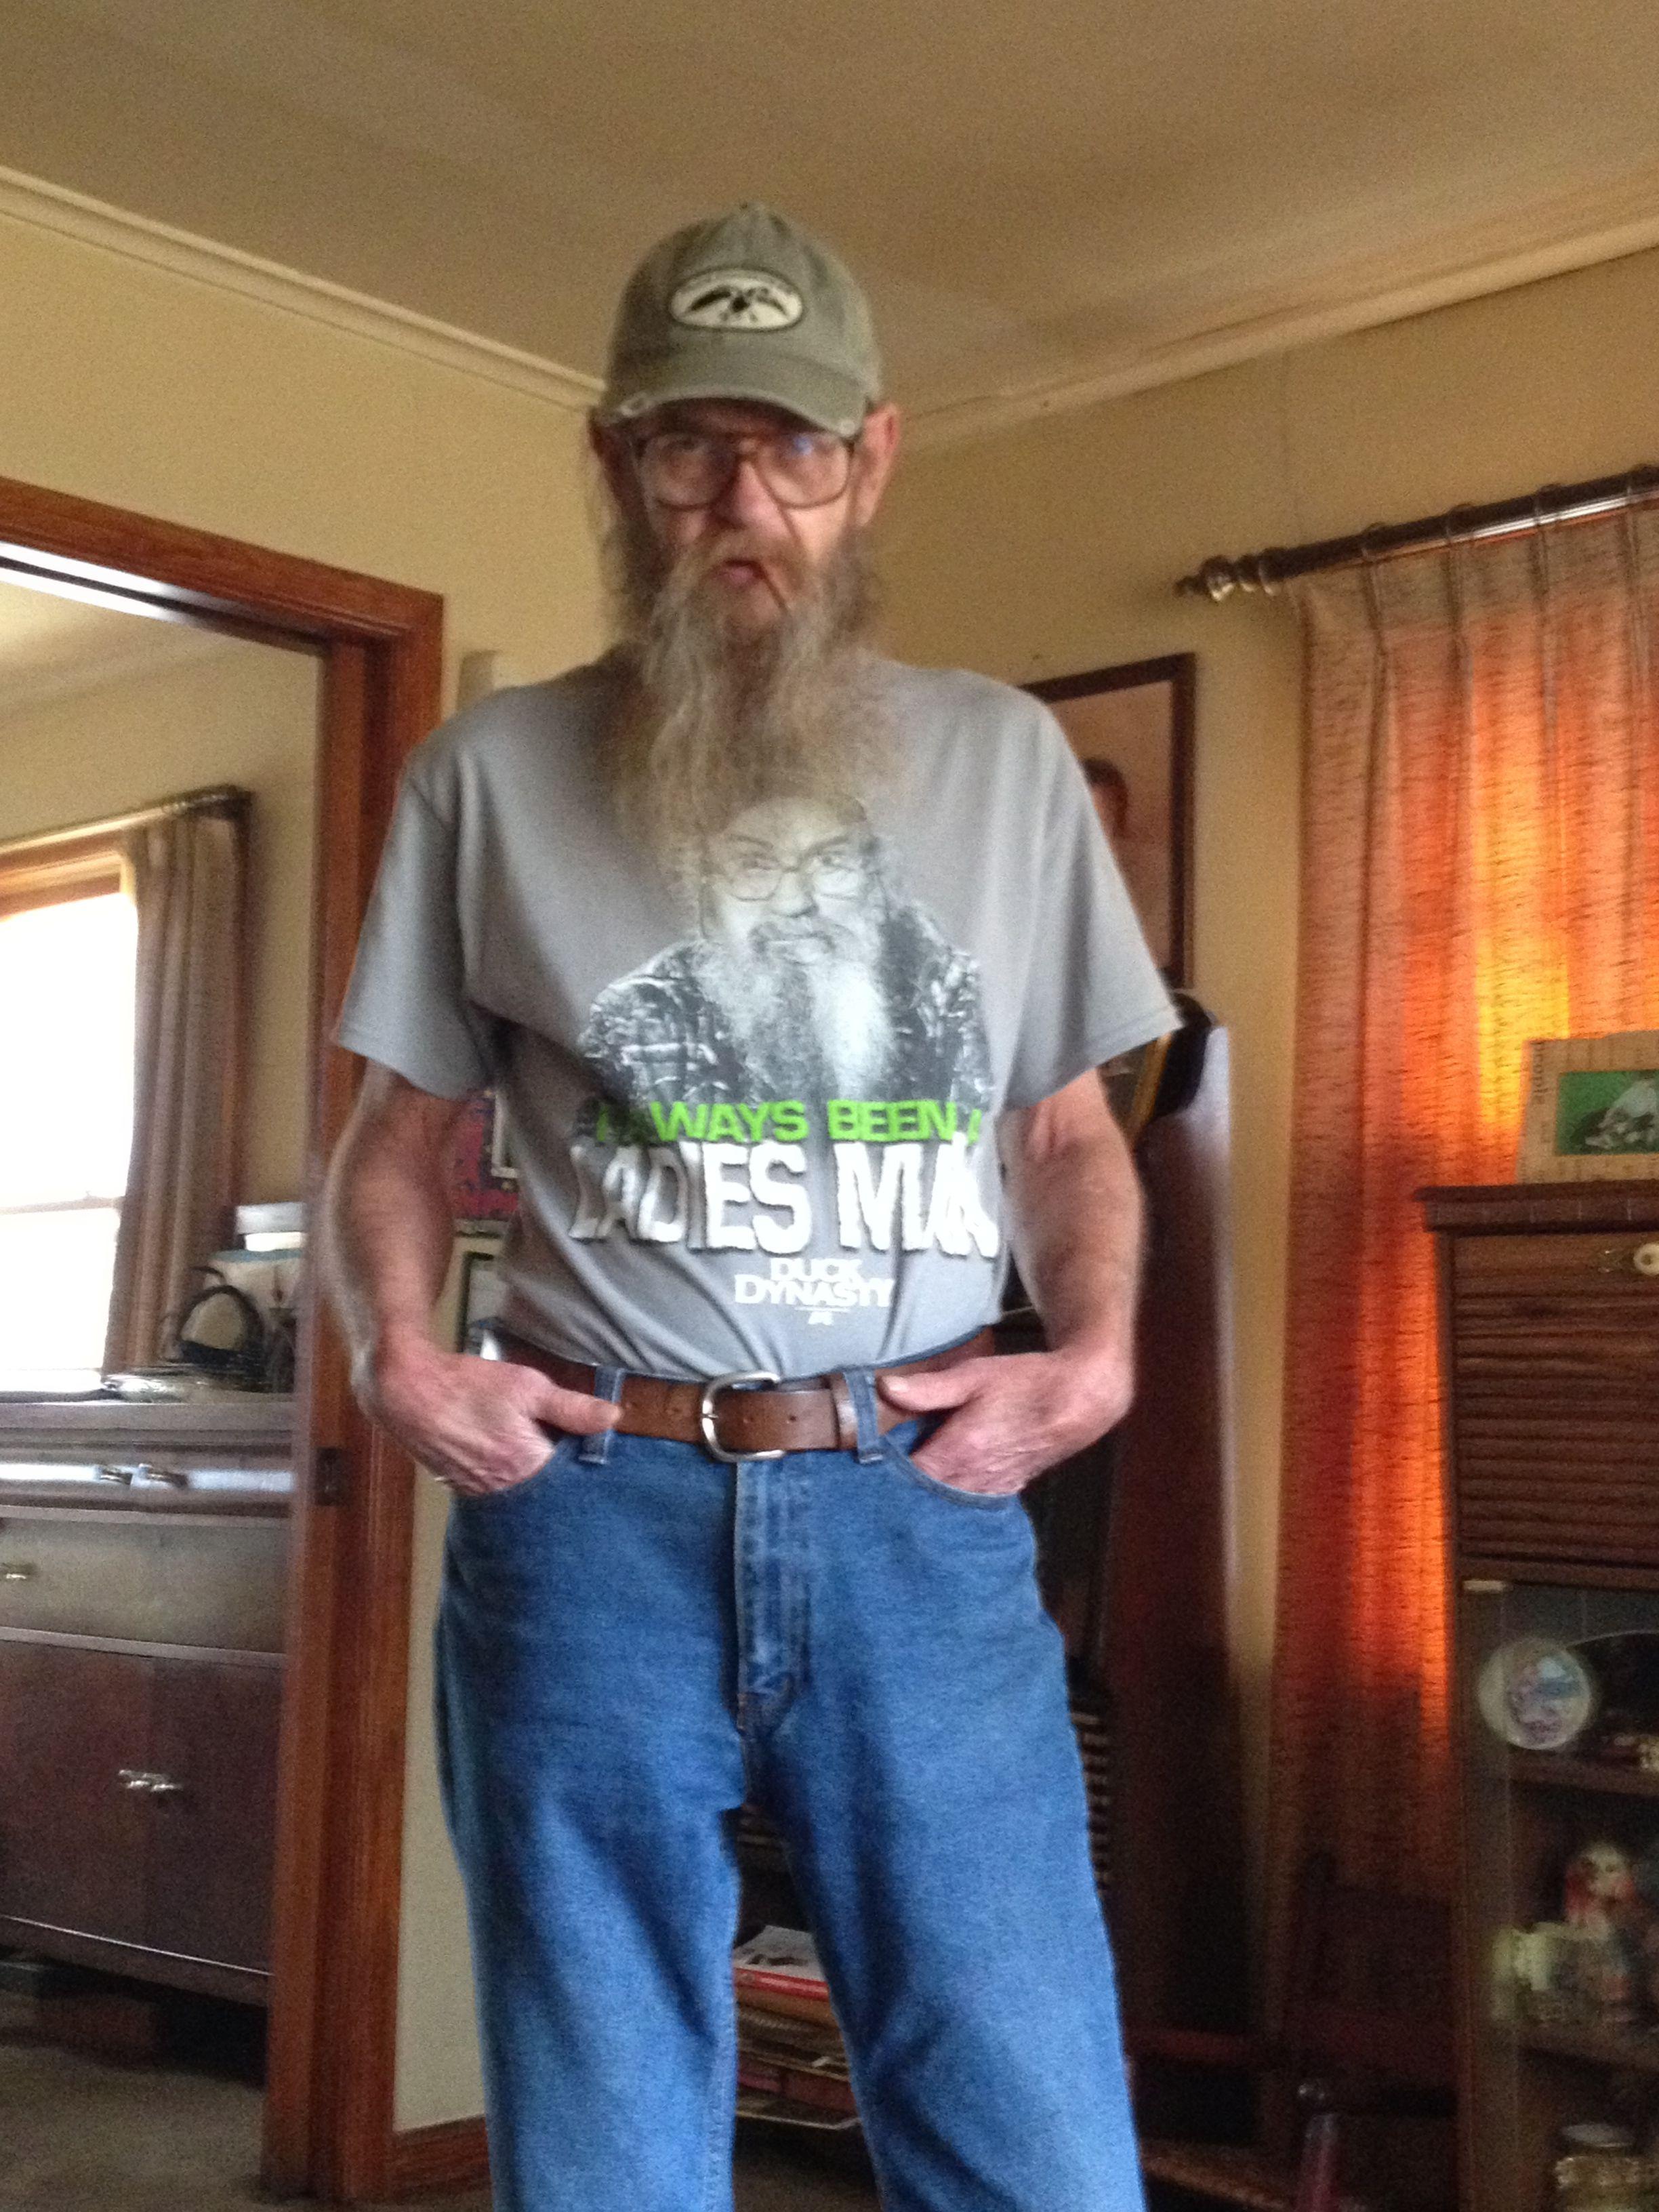 My dad. Love him.  Uncle Si's long lost twin. #mydadsbetterthanyourdad. #duckdynasty